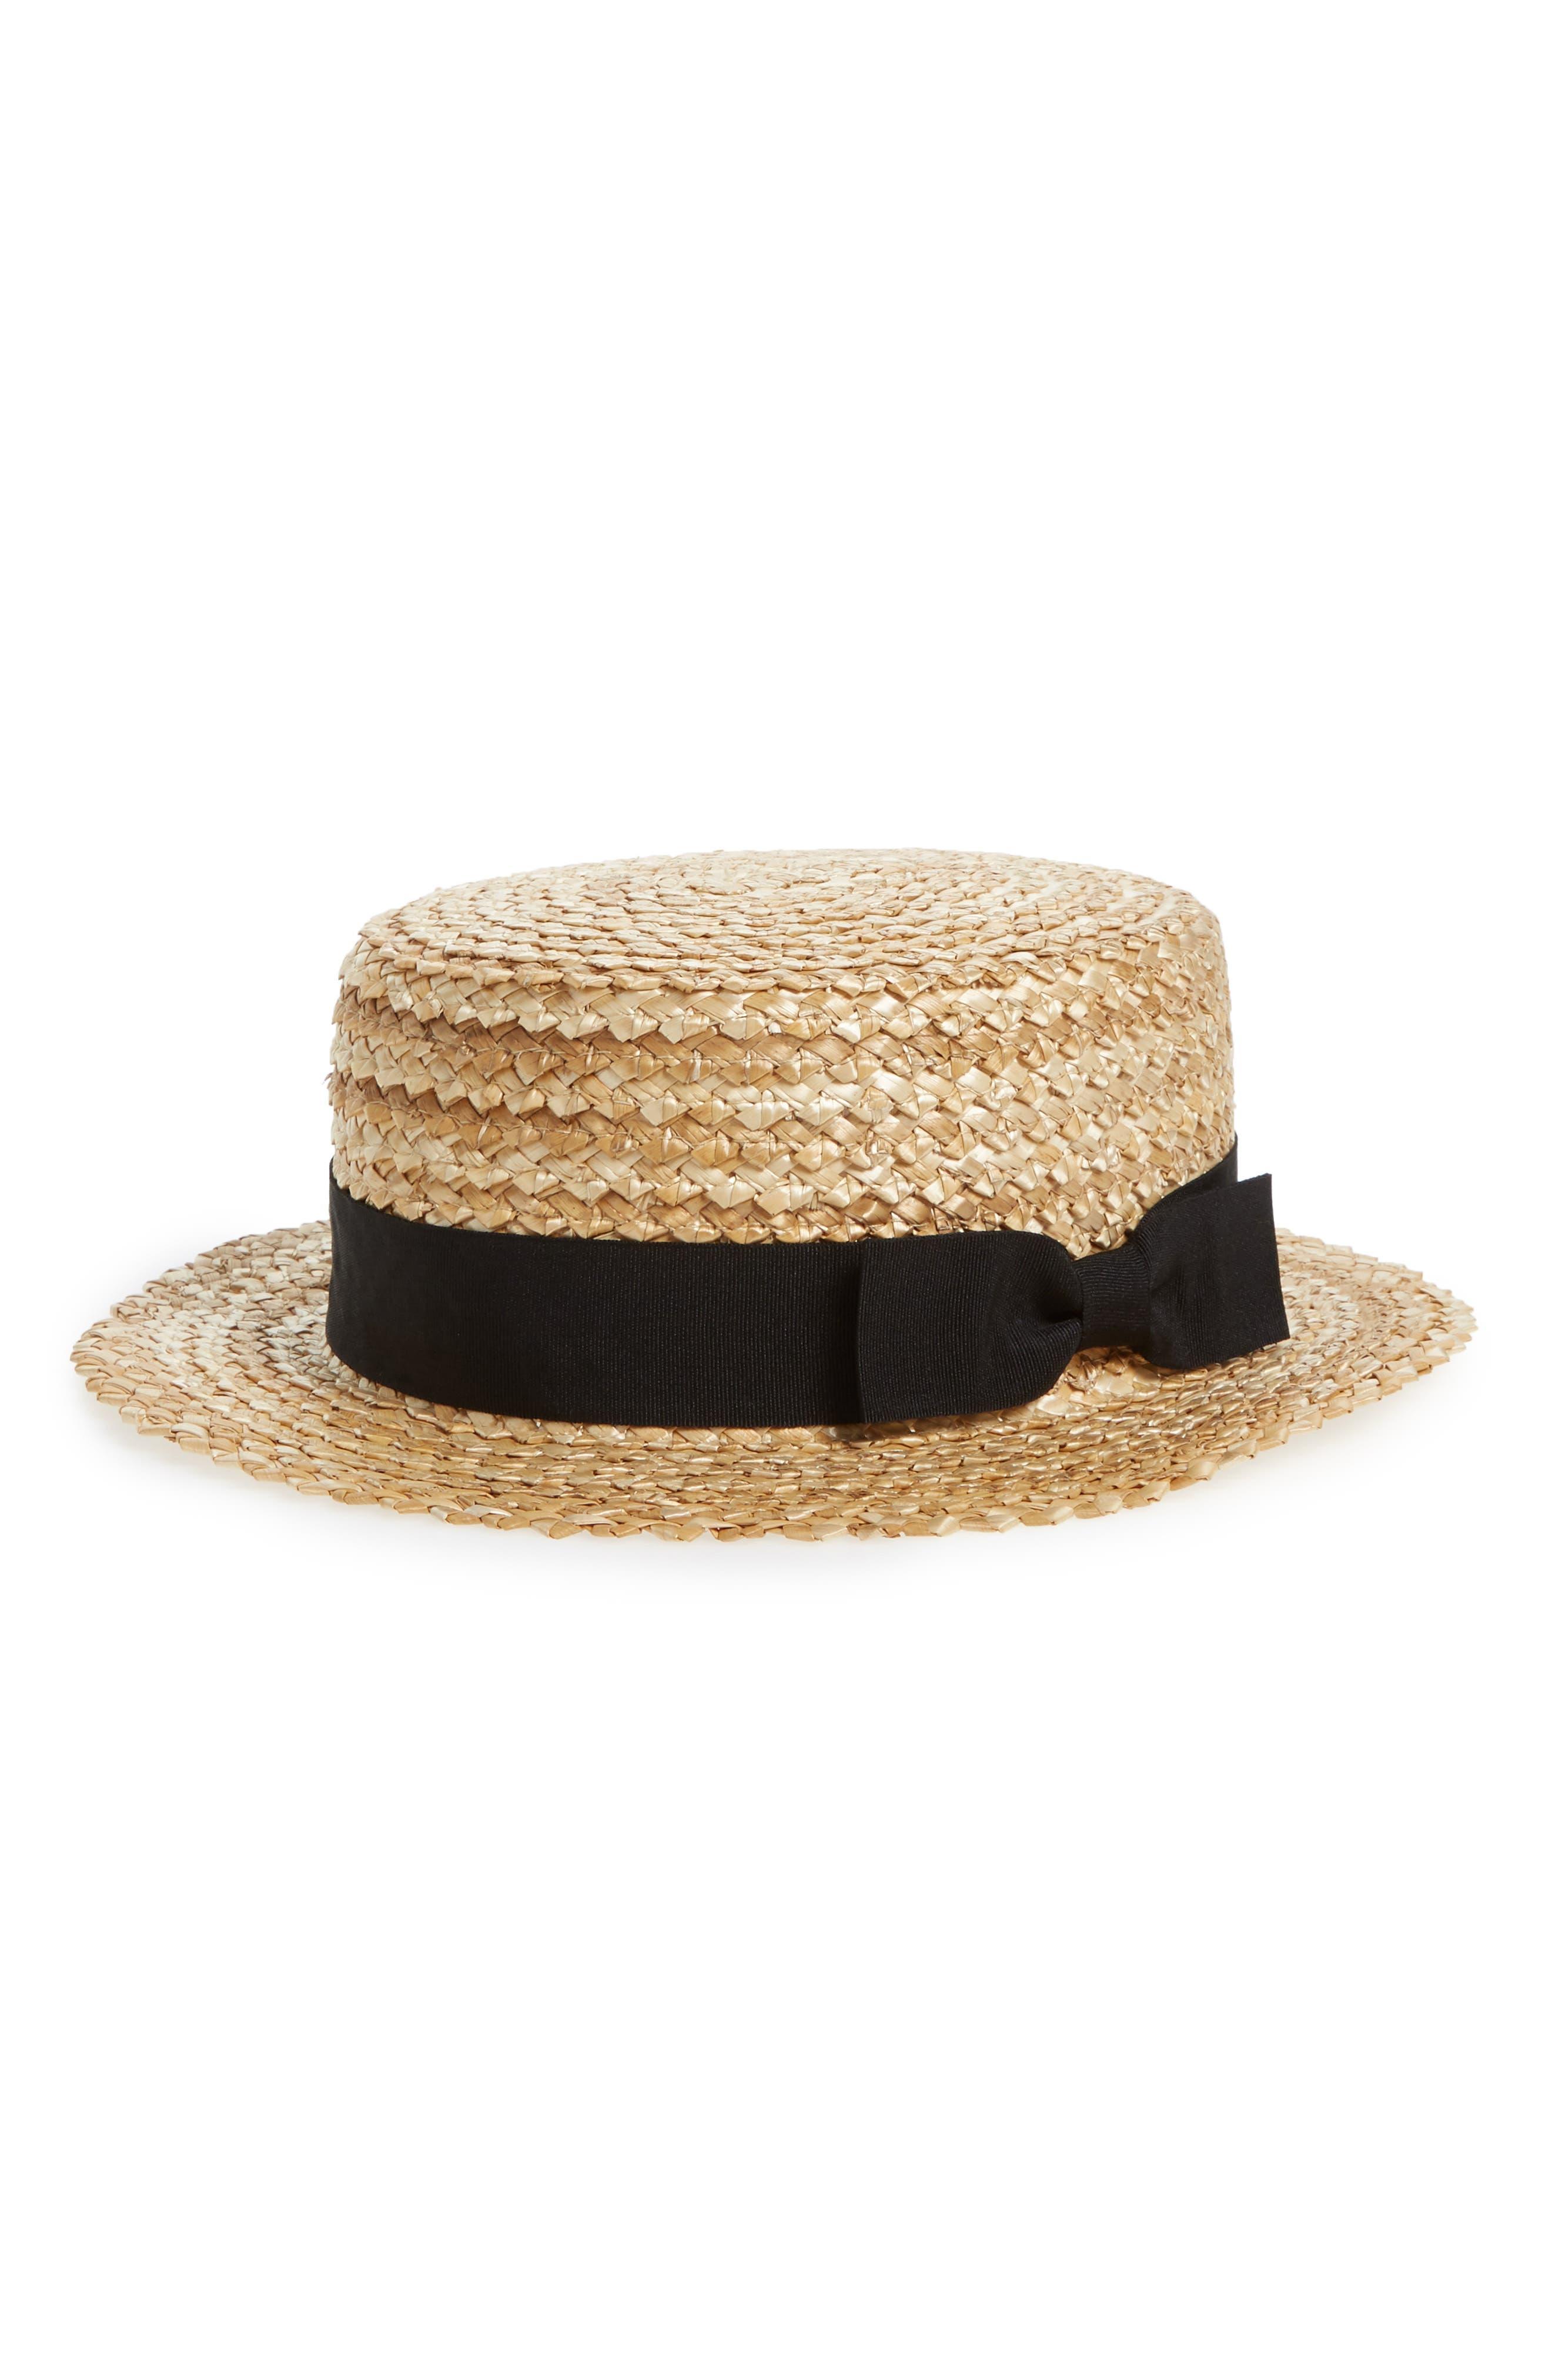 Kitsch Ribbon Straw Boater Hat